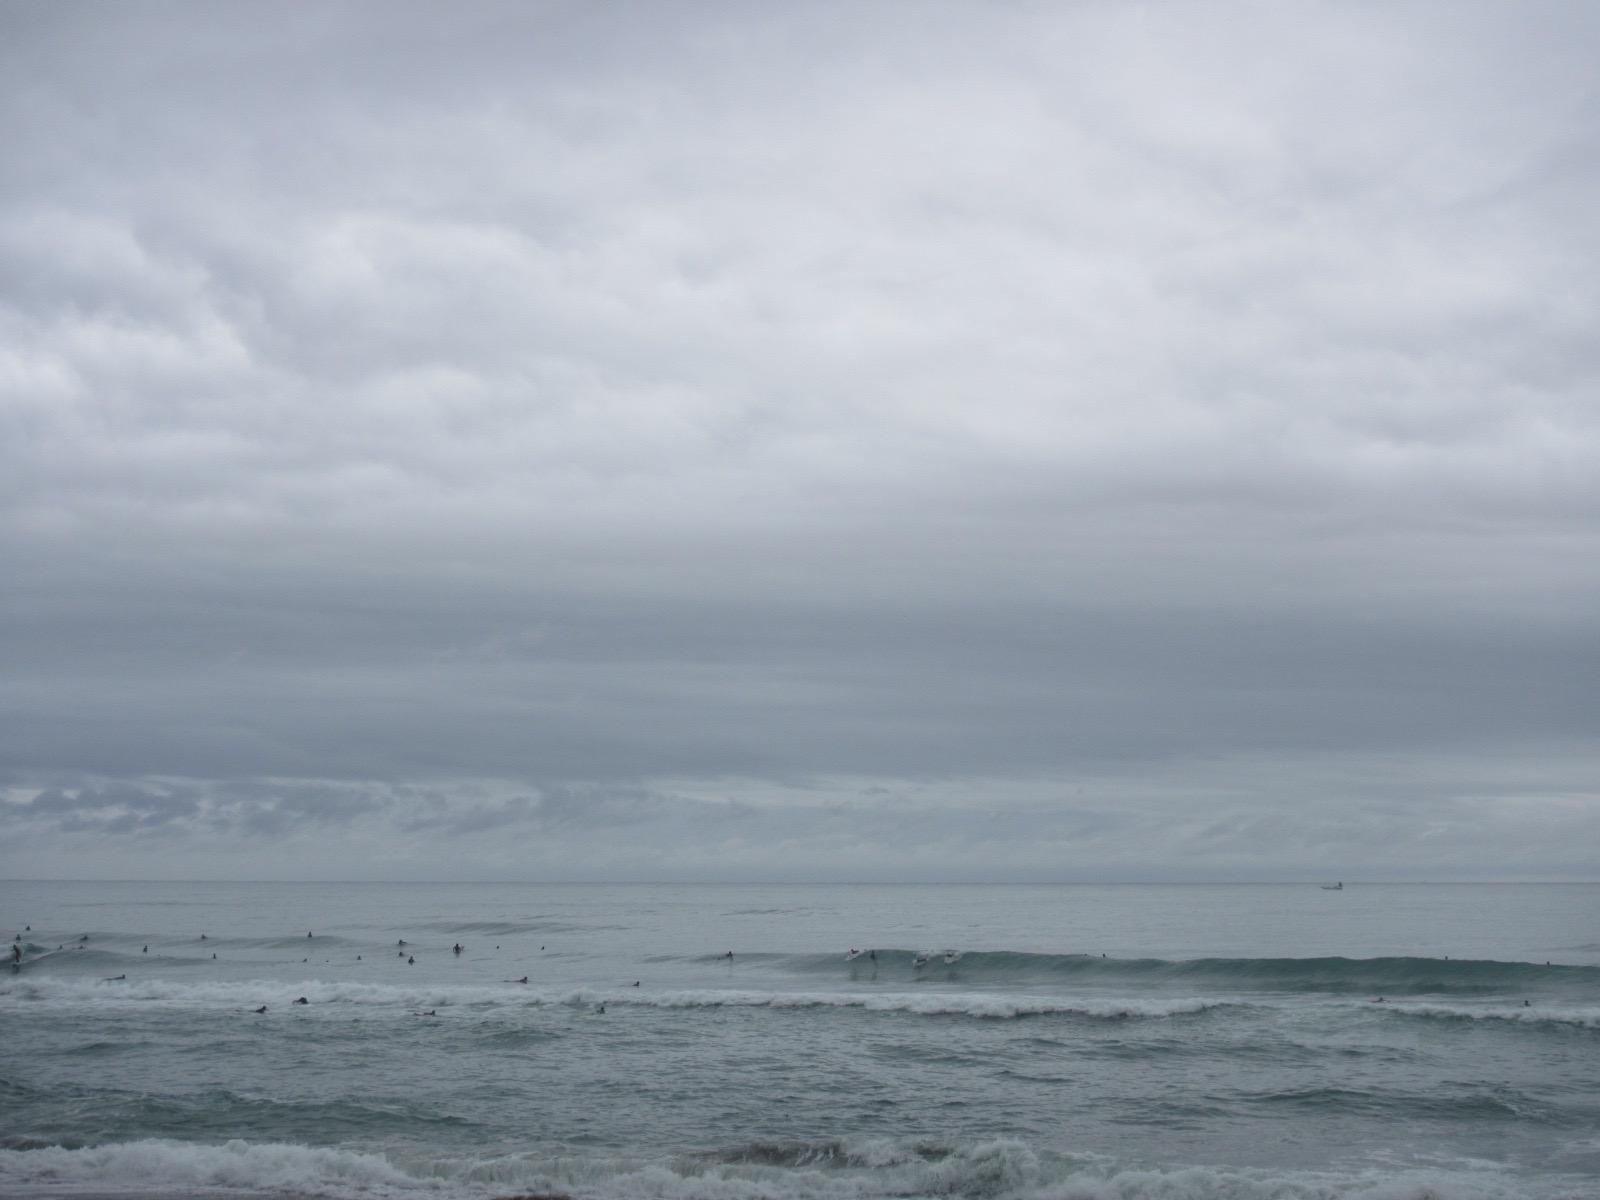 0927goodwave - 9